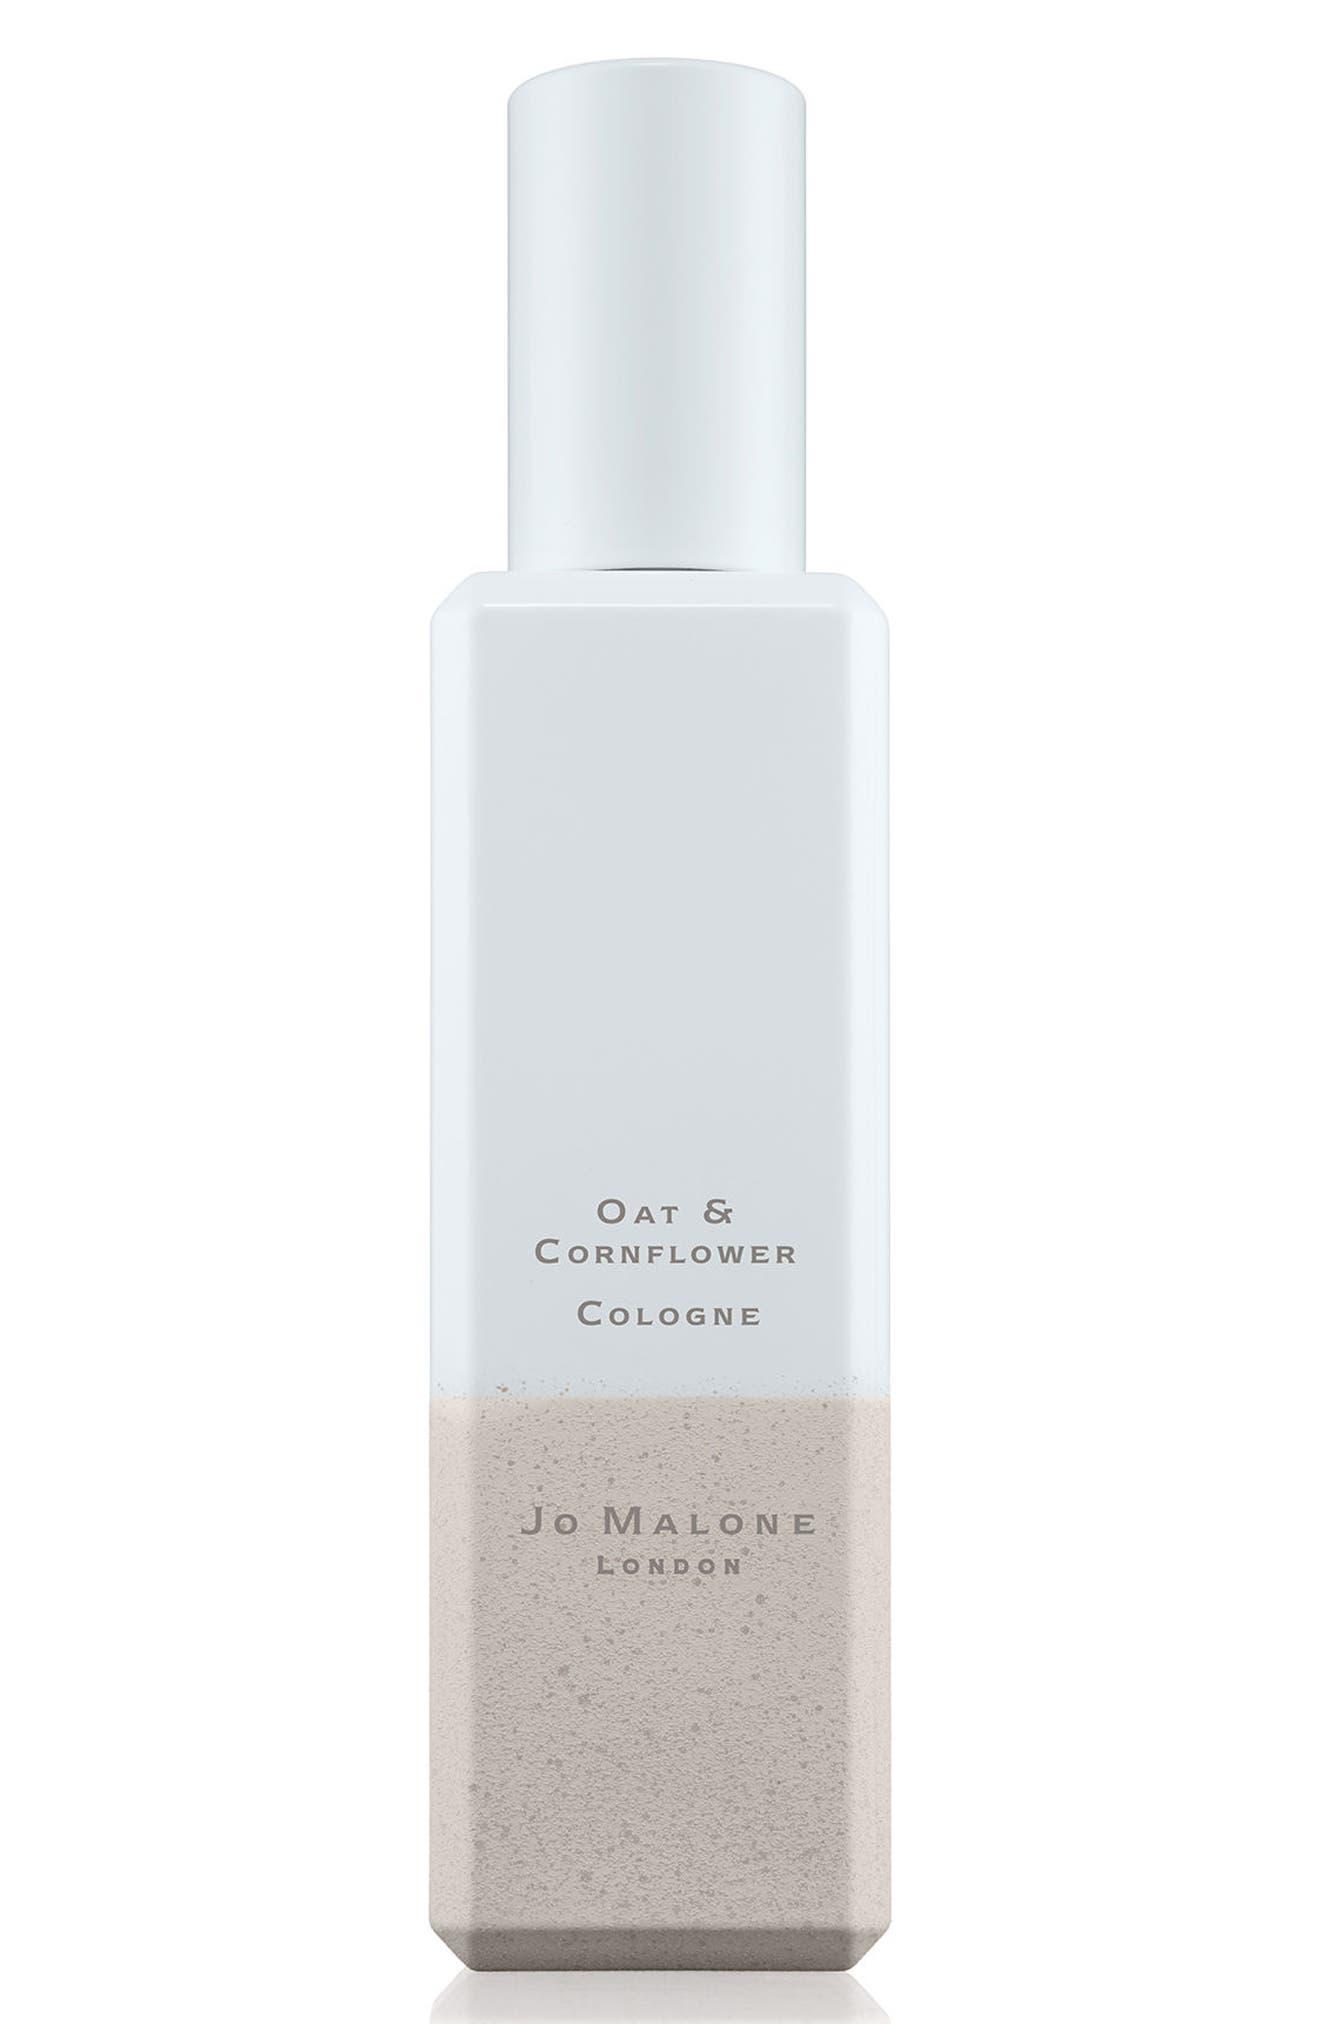 Jo Malone London™ English Fields Oat & Cornflower Cologne (Limited Edition)